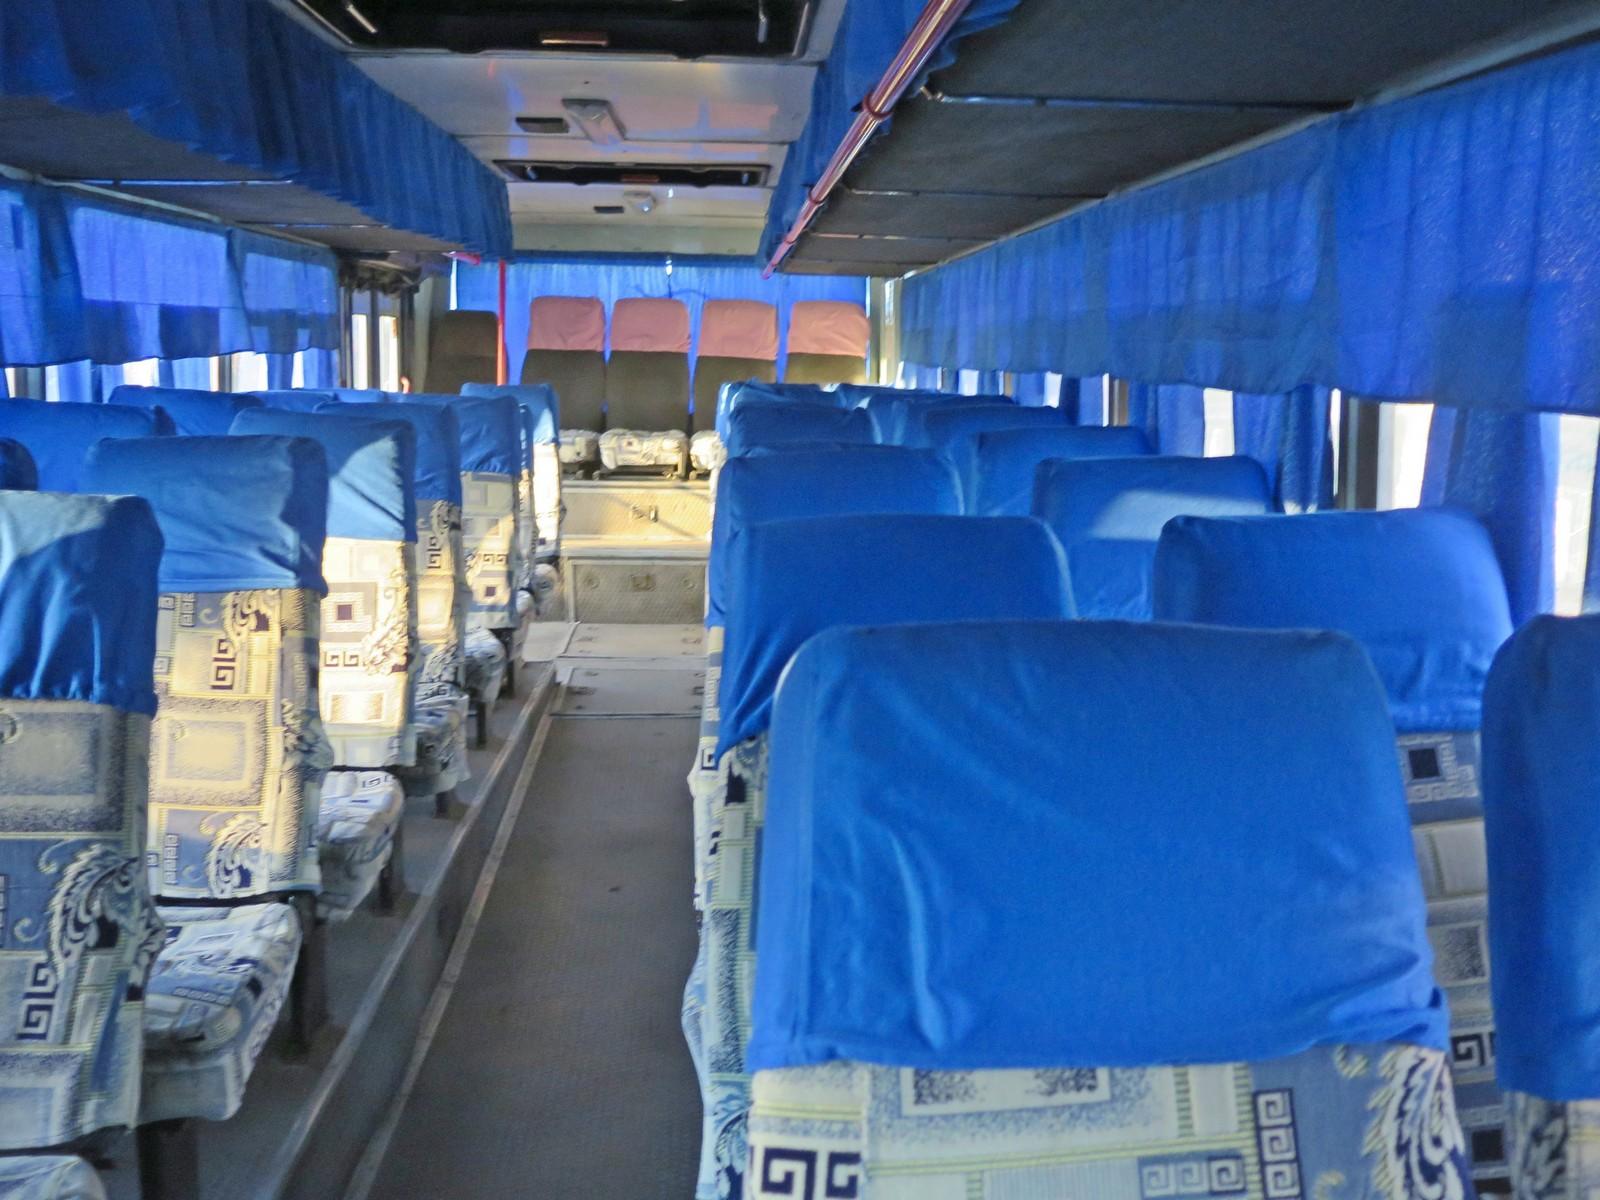 Салон автобуса Белицк-Жлобин